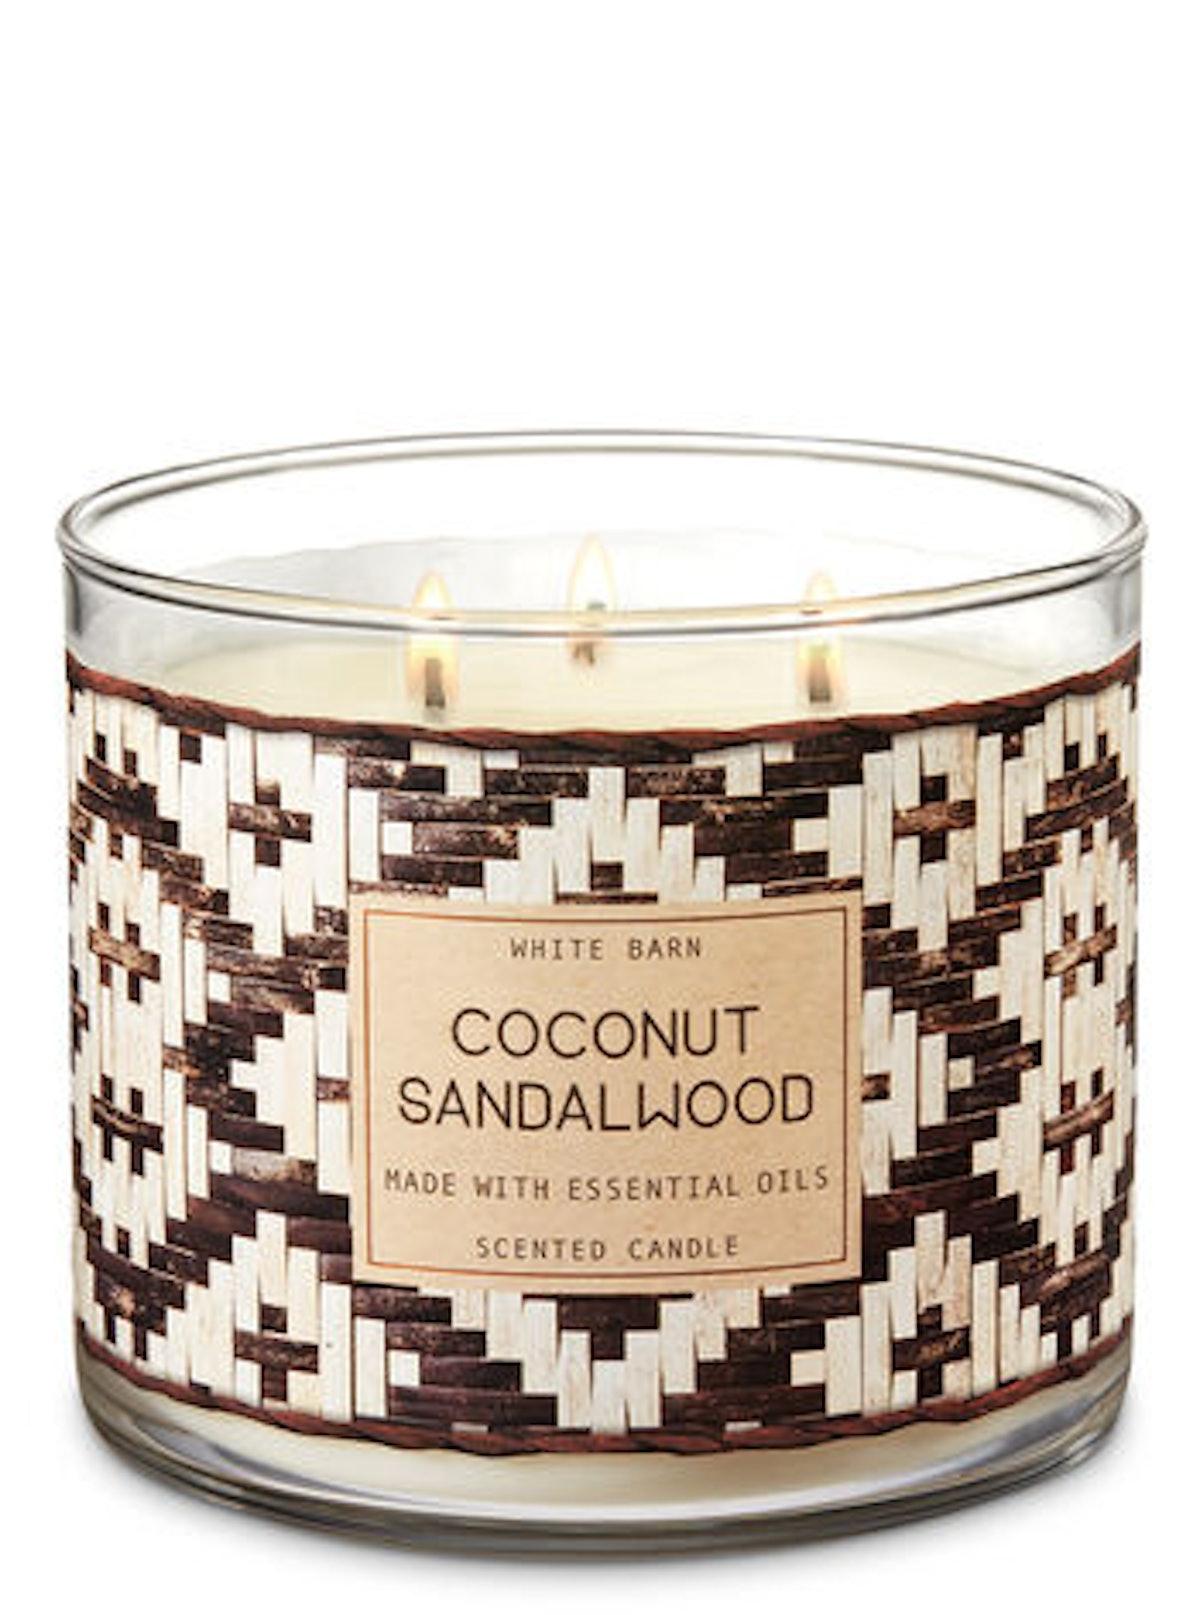 Coconut Sandalwood Three-Wick Candle